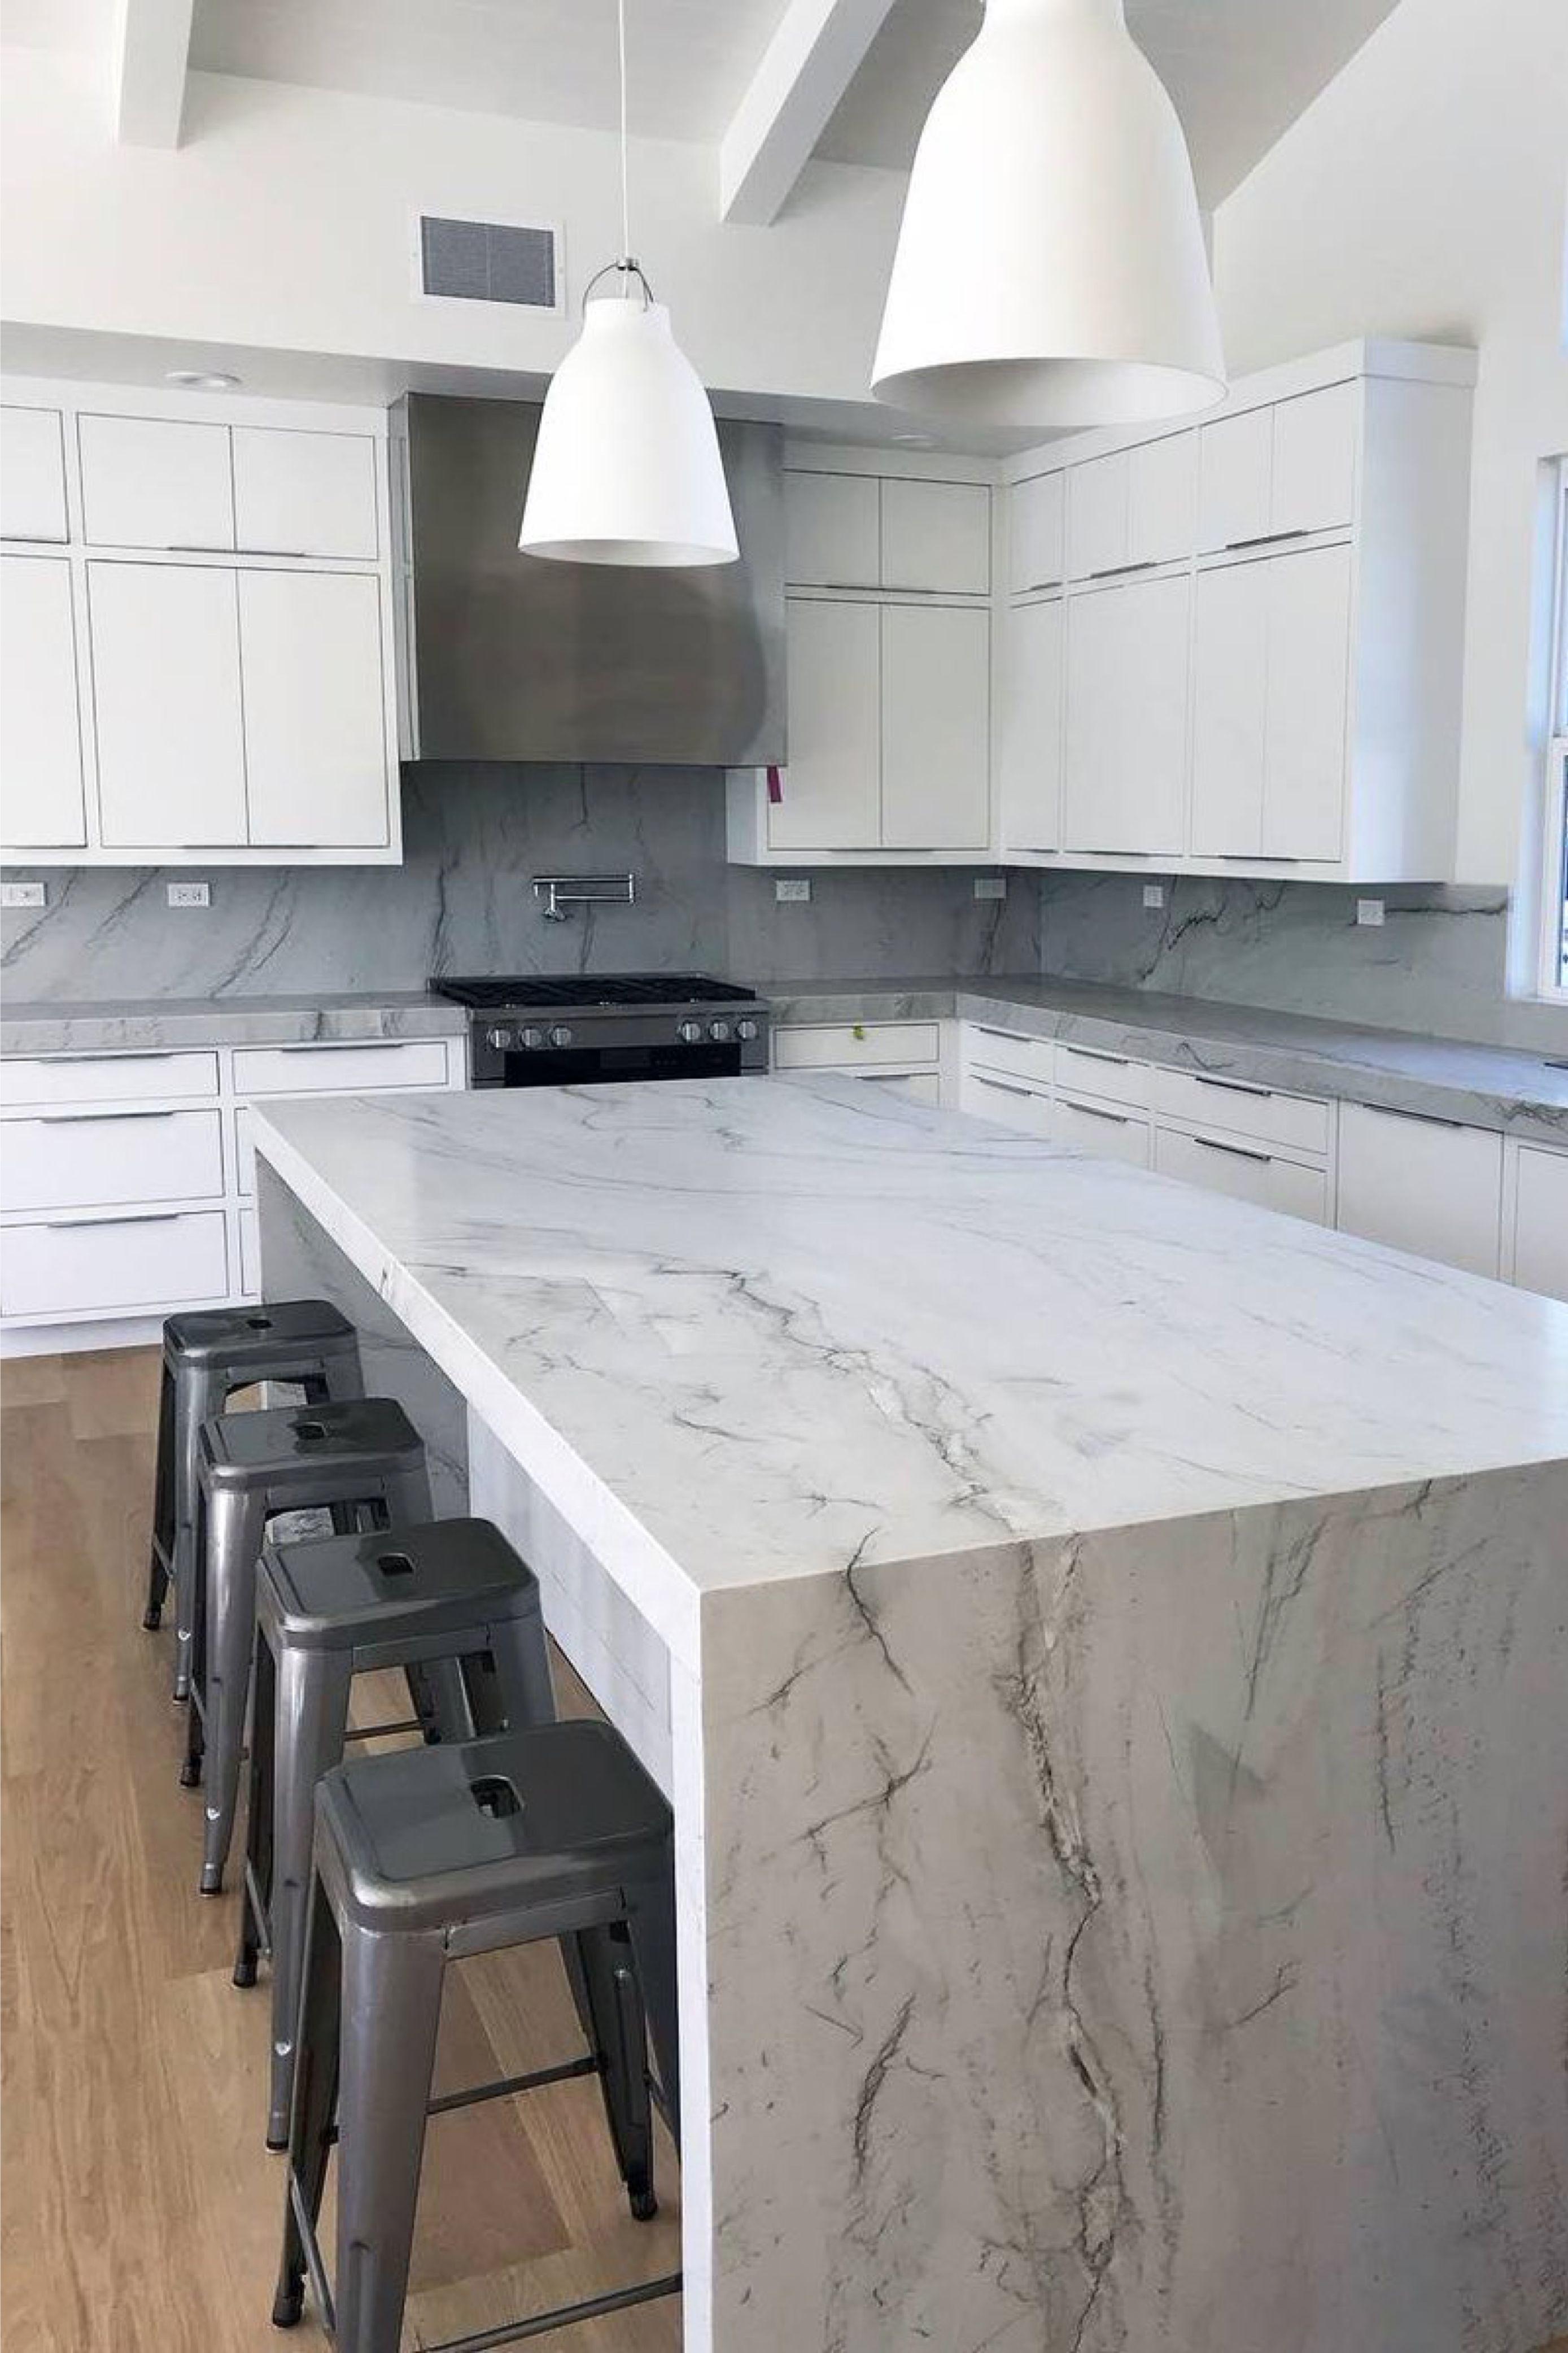 Mont Blanc Quartzite Countertops Cost Reviews Kitchen Remodel Small Kitchen Countertops Pictures Kitchen Interior